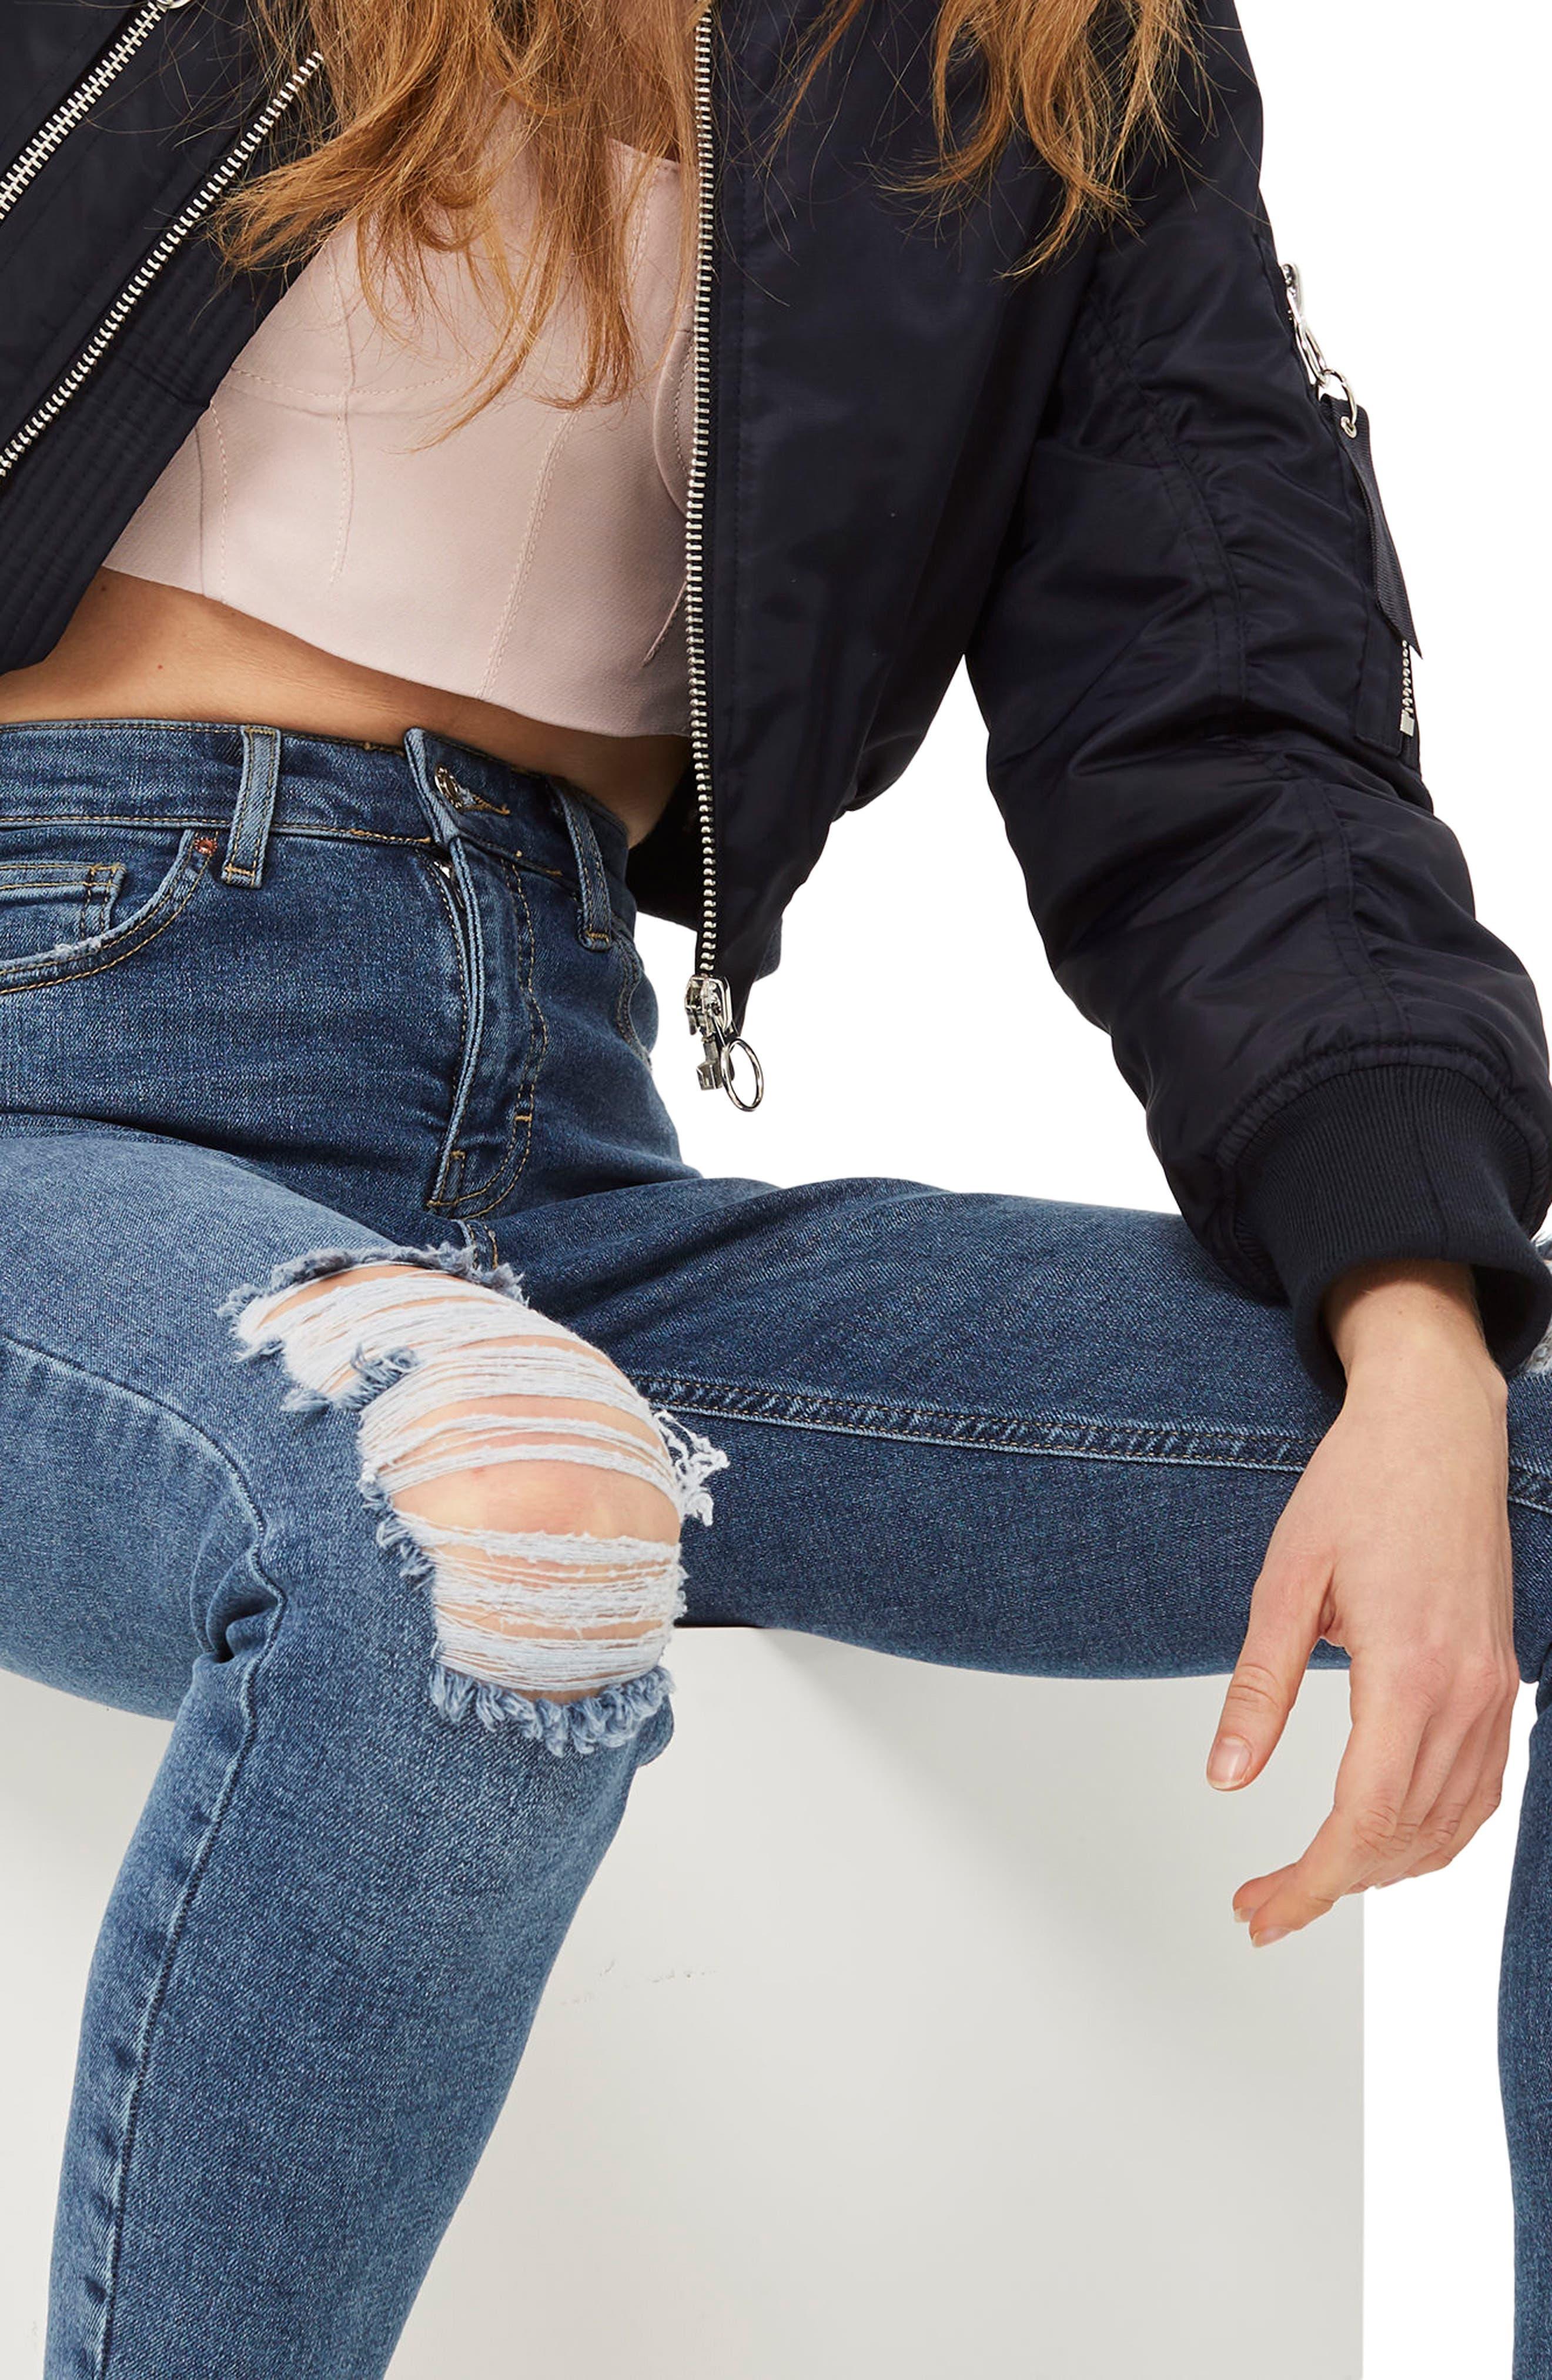 Jamie Petite Ripped Jeans,                             Main thumbnail 1, color,                             Mid Denim